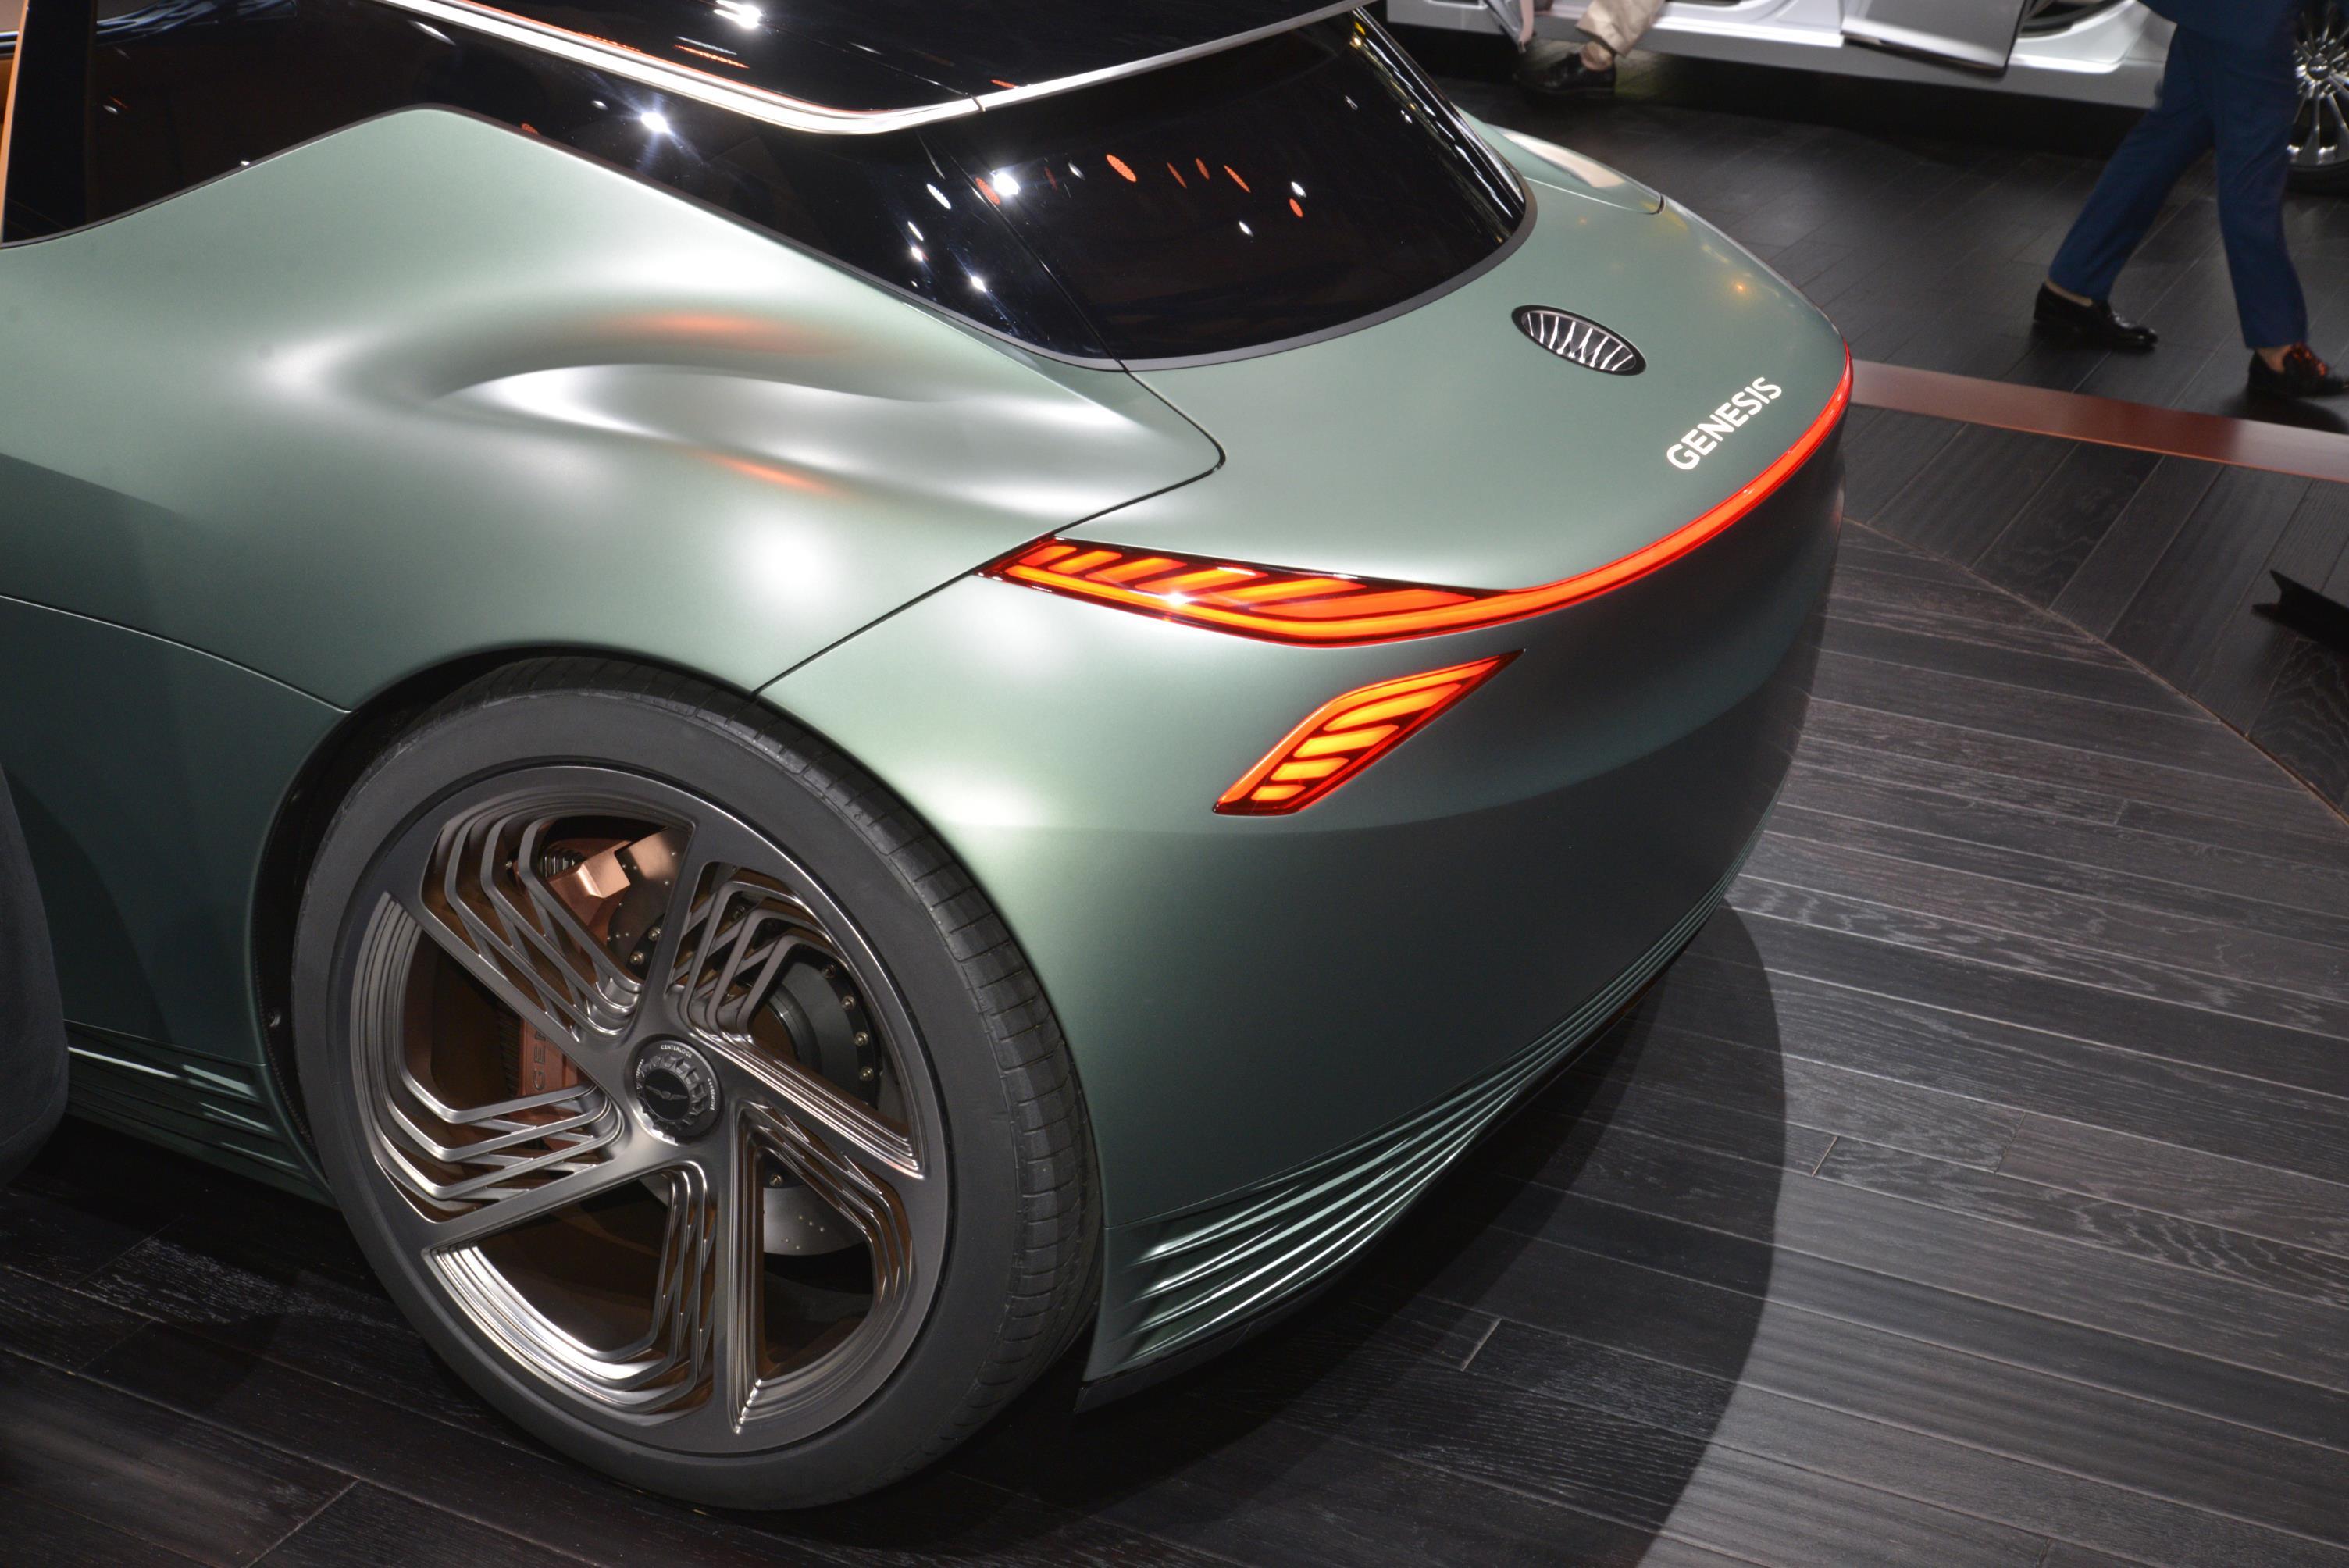 bebd4c4090f Genesis Mint Concept1 - myAutoWorld.com